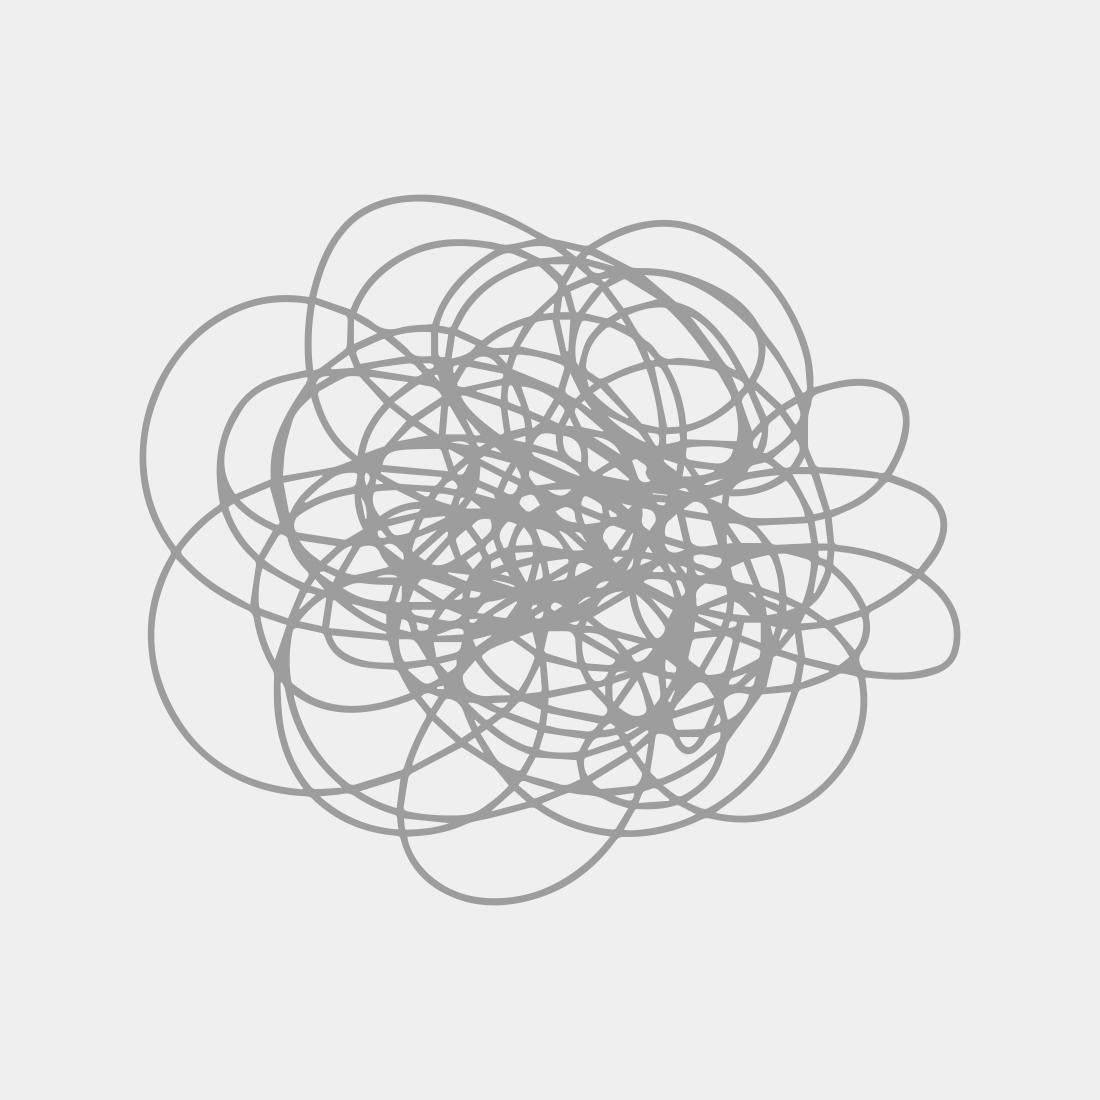 ** Pre Order Date 21DEC20 ** Varnishing Day Portfolio Frame, Oak